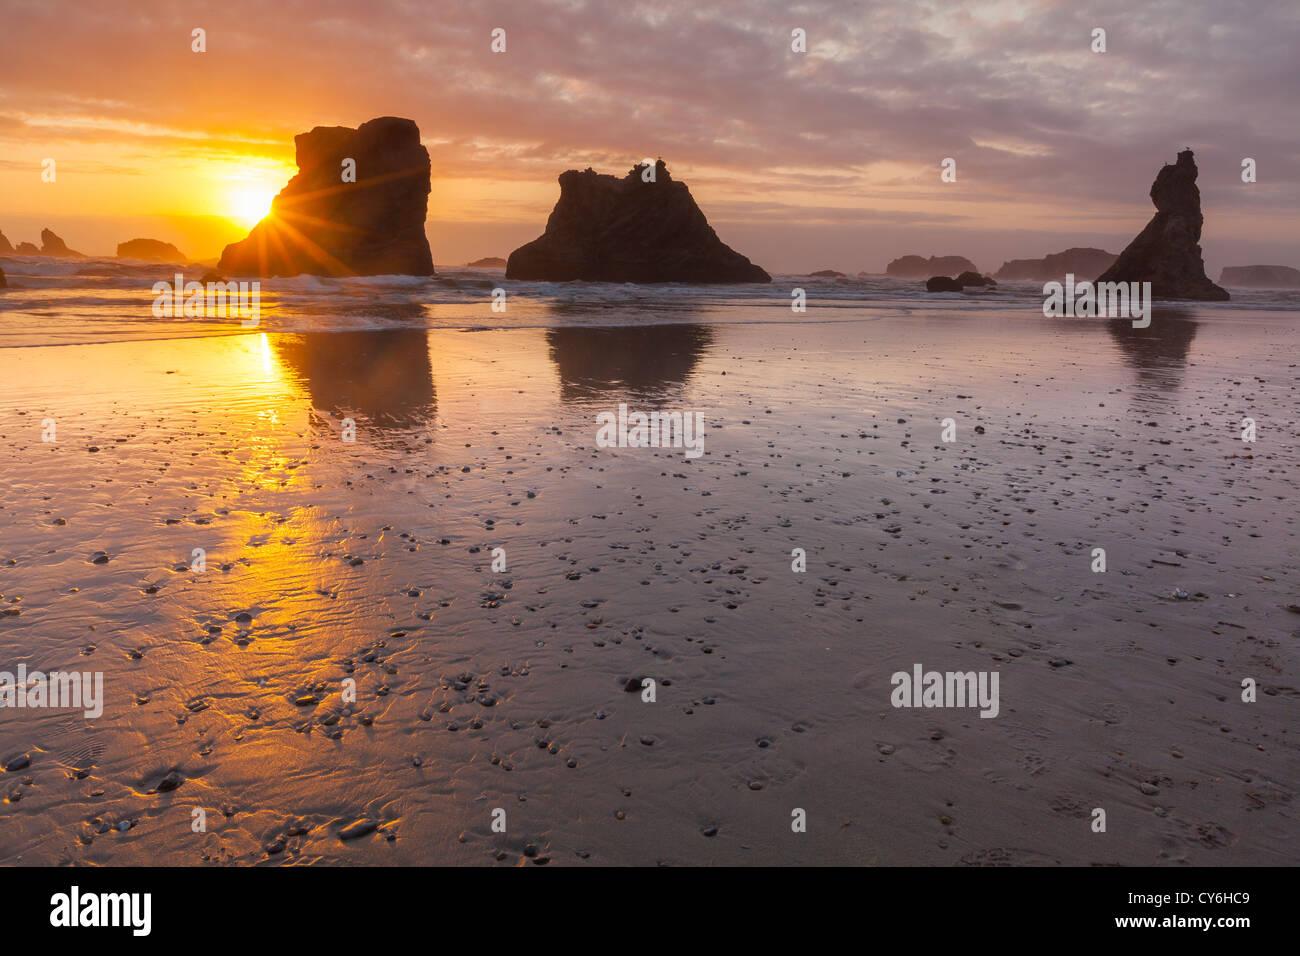 Staatspark Bandon, Oregon: Sonnenuntergang Reflektionen bei Ebbe mit Silhouette Seastacks Bandon Beach Stockbild